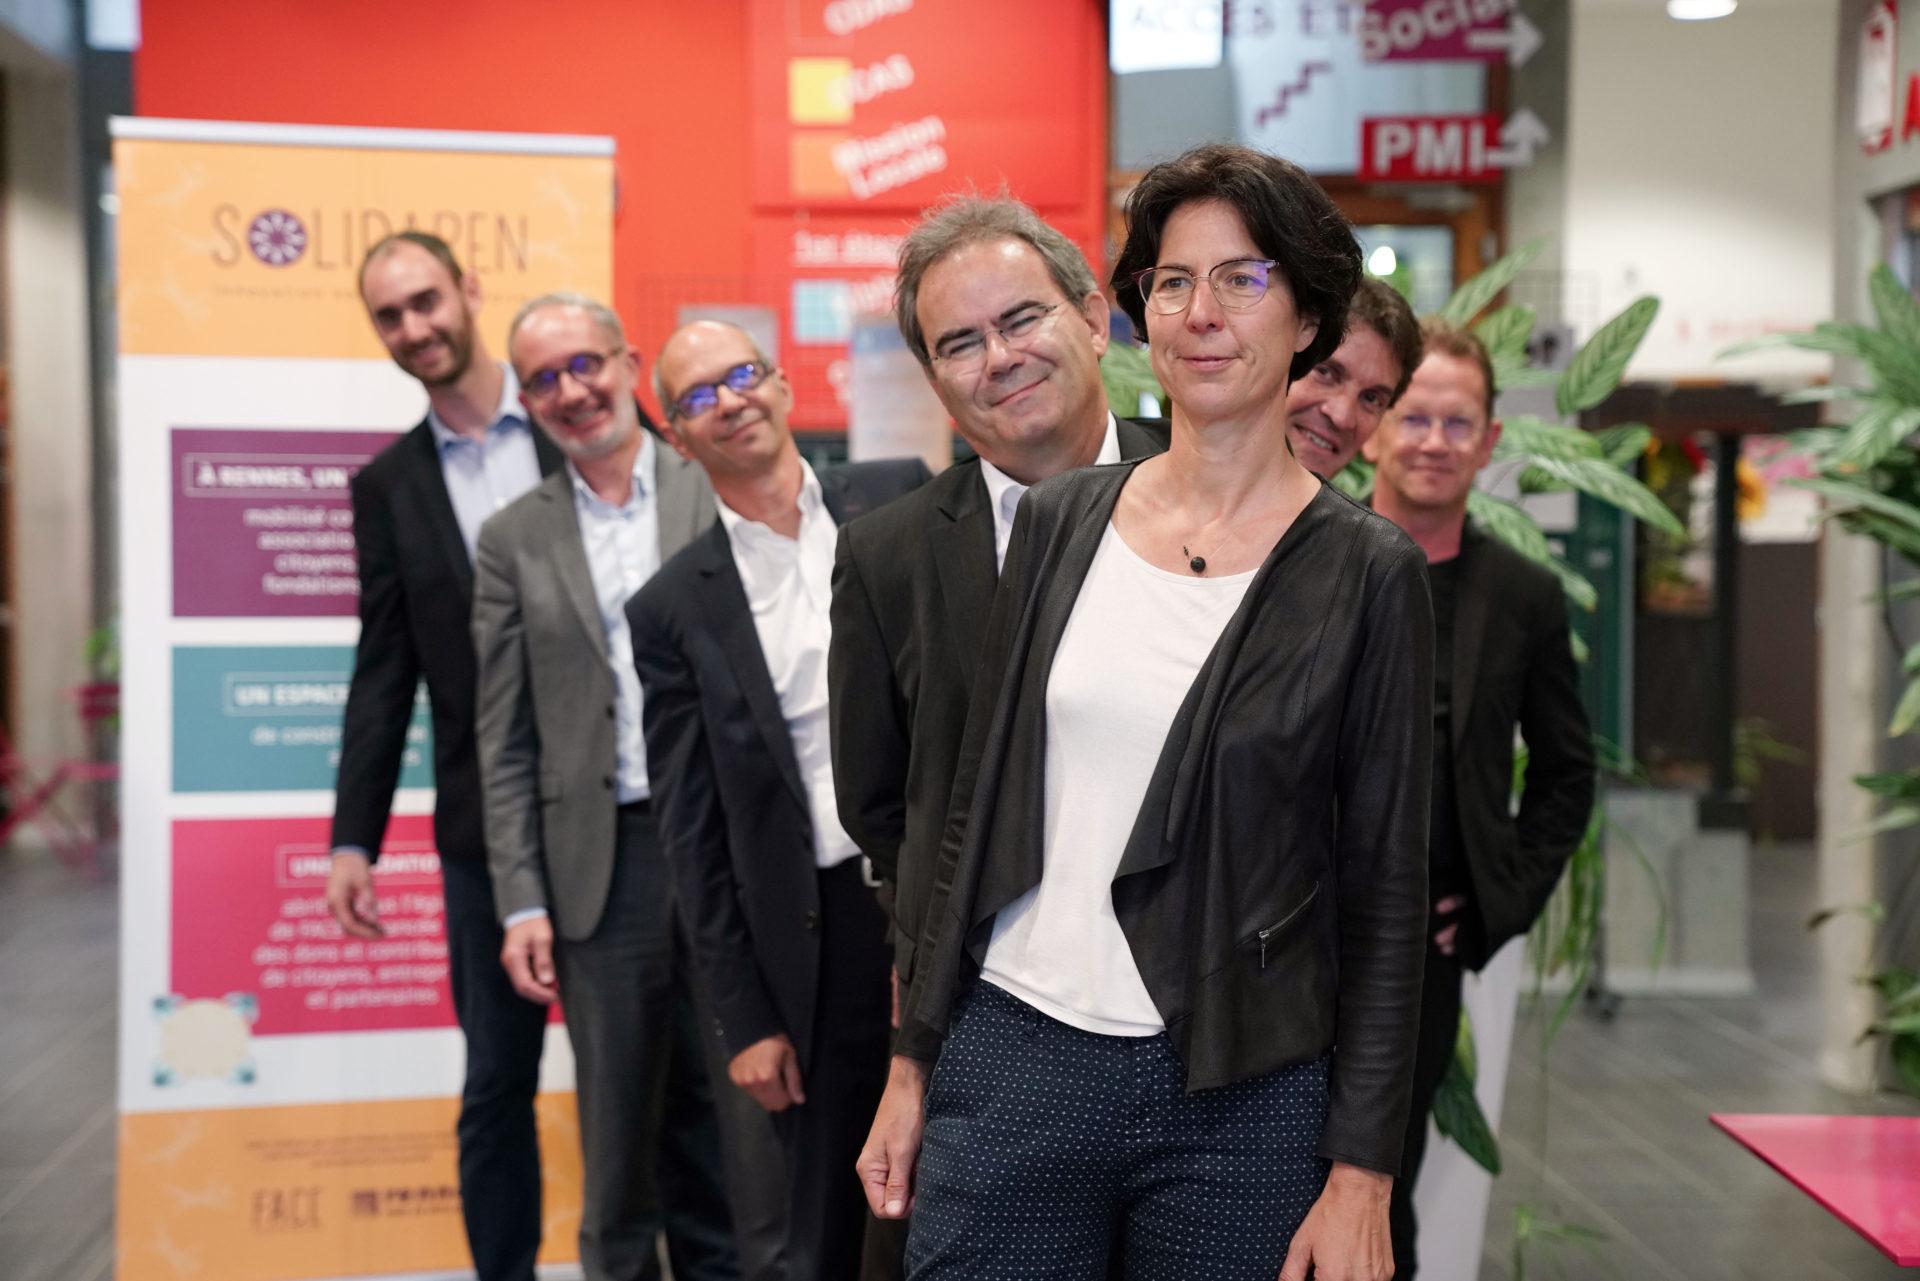 Portrait debout en enfilade des membres du comité exécutif SolidaRen